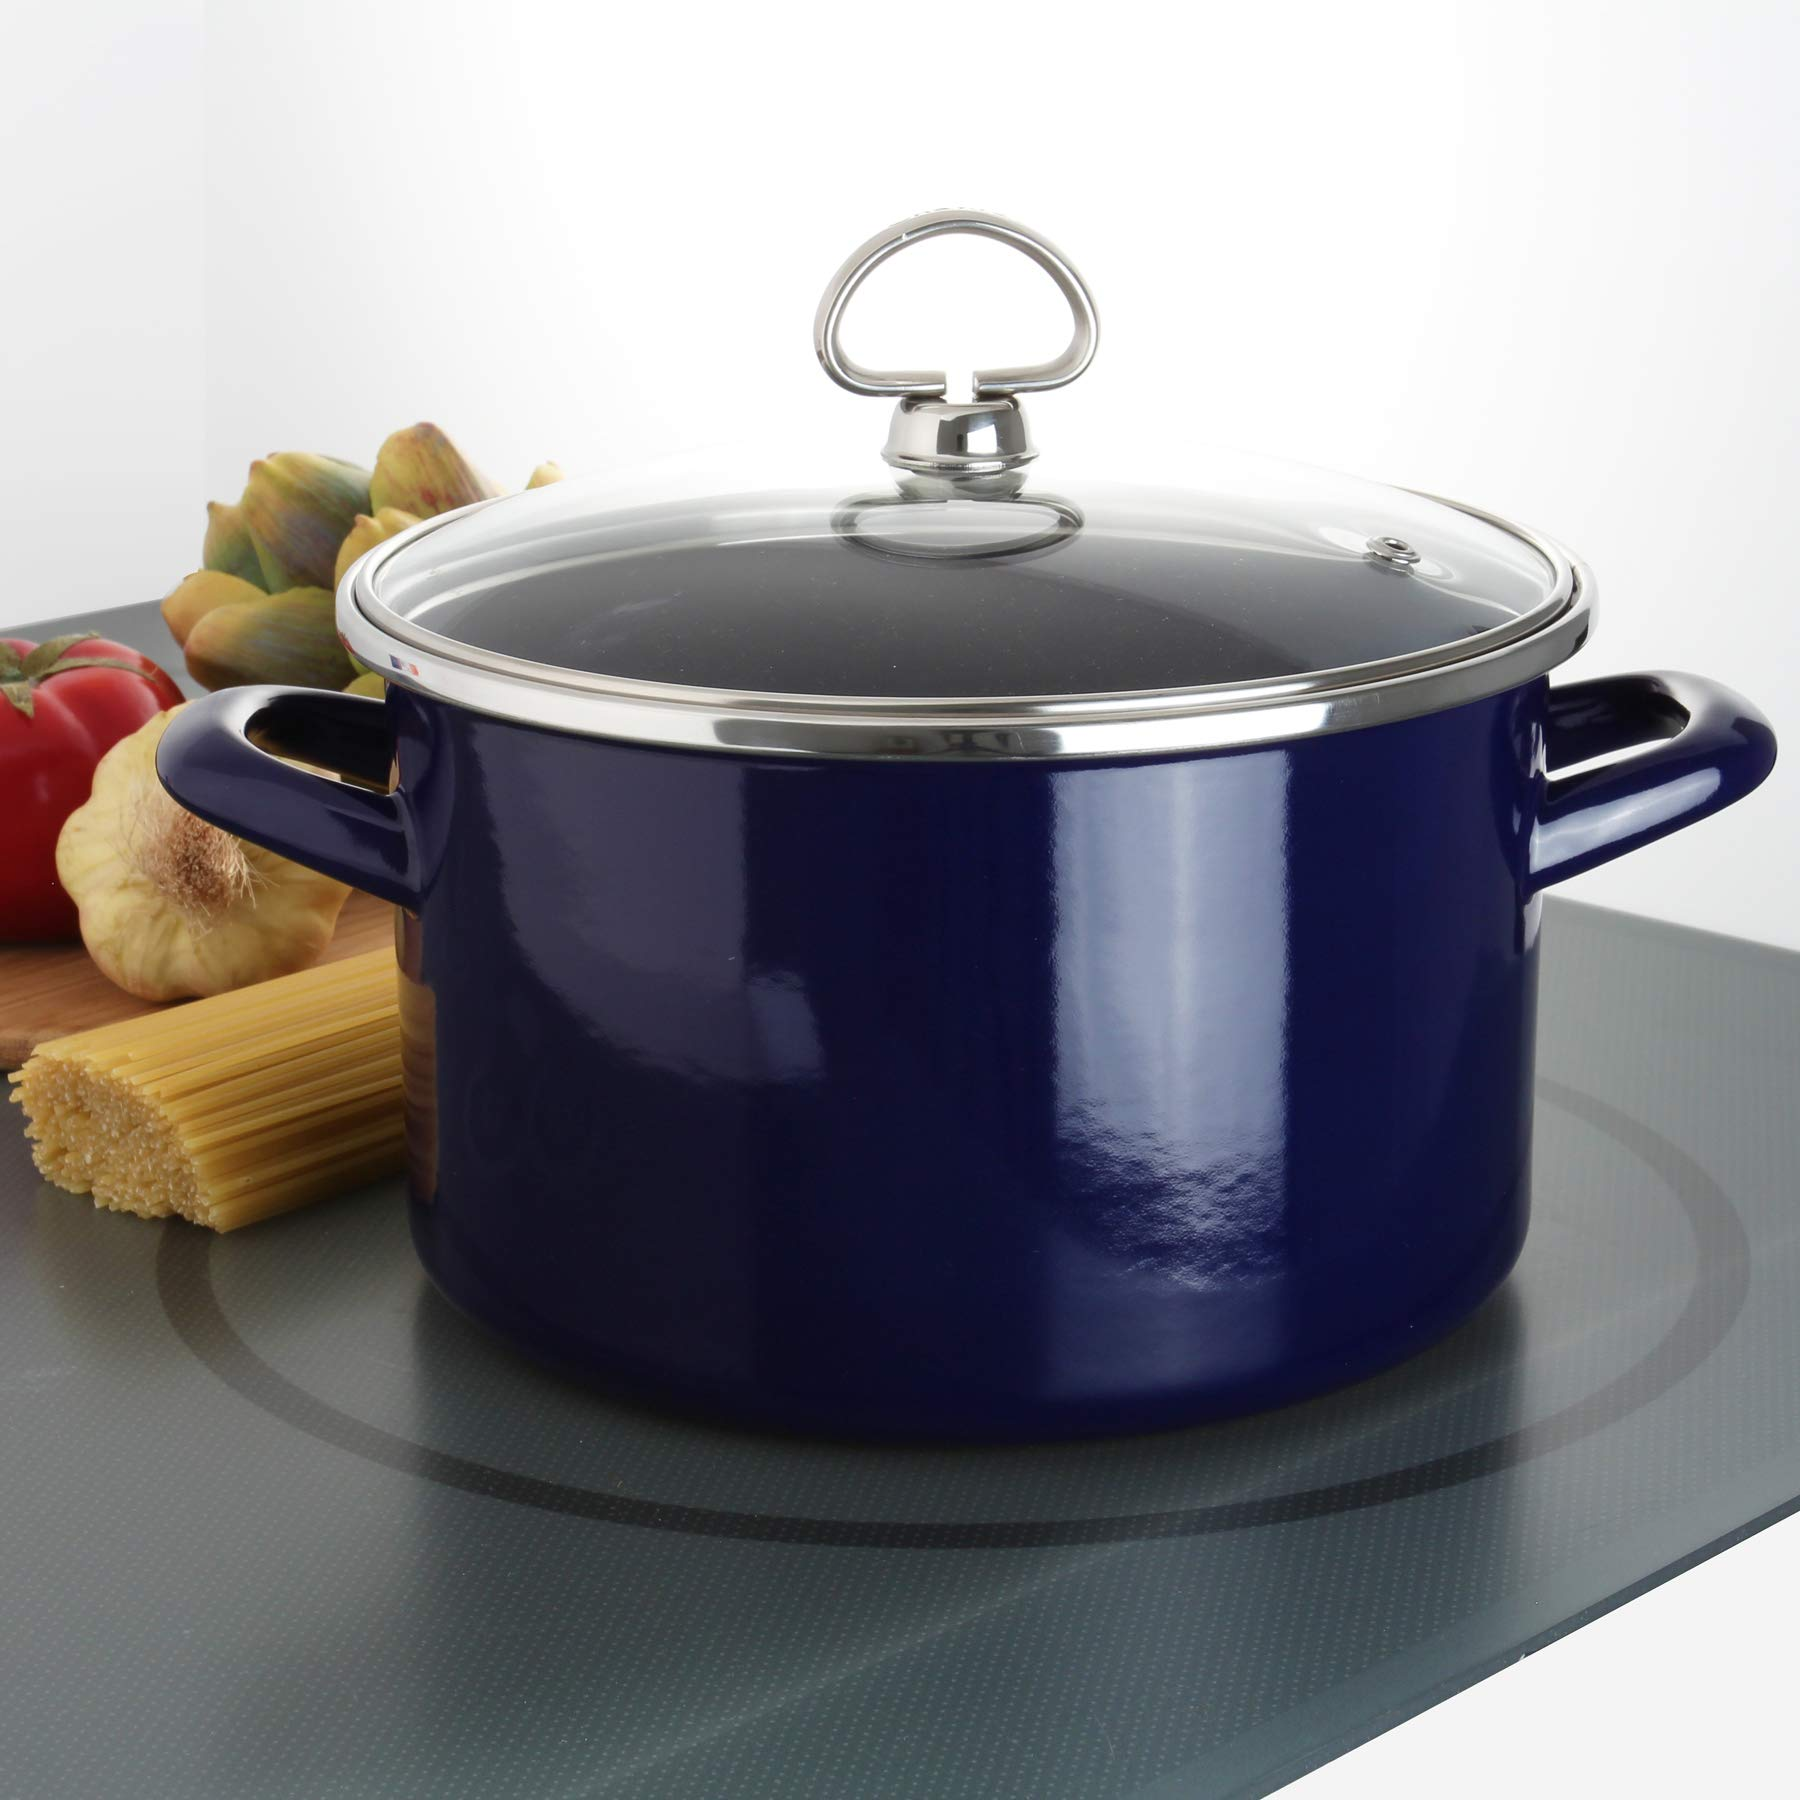 Chantal Enamel-On-Steel 4-Quart Soup Pot with Tempered Glass Lid, Cobalt Blue